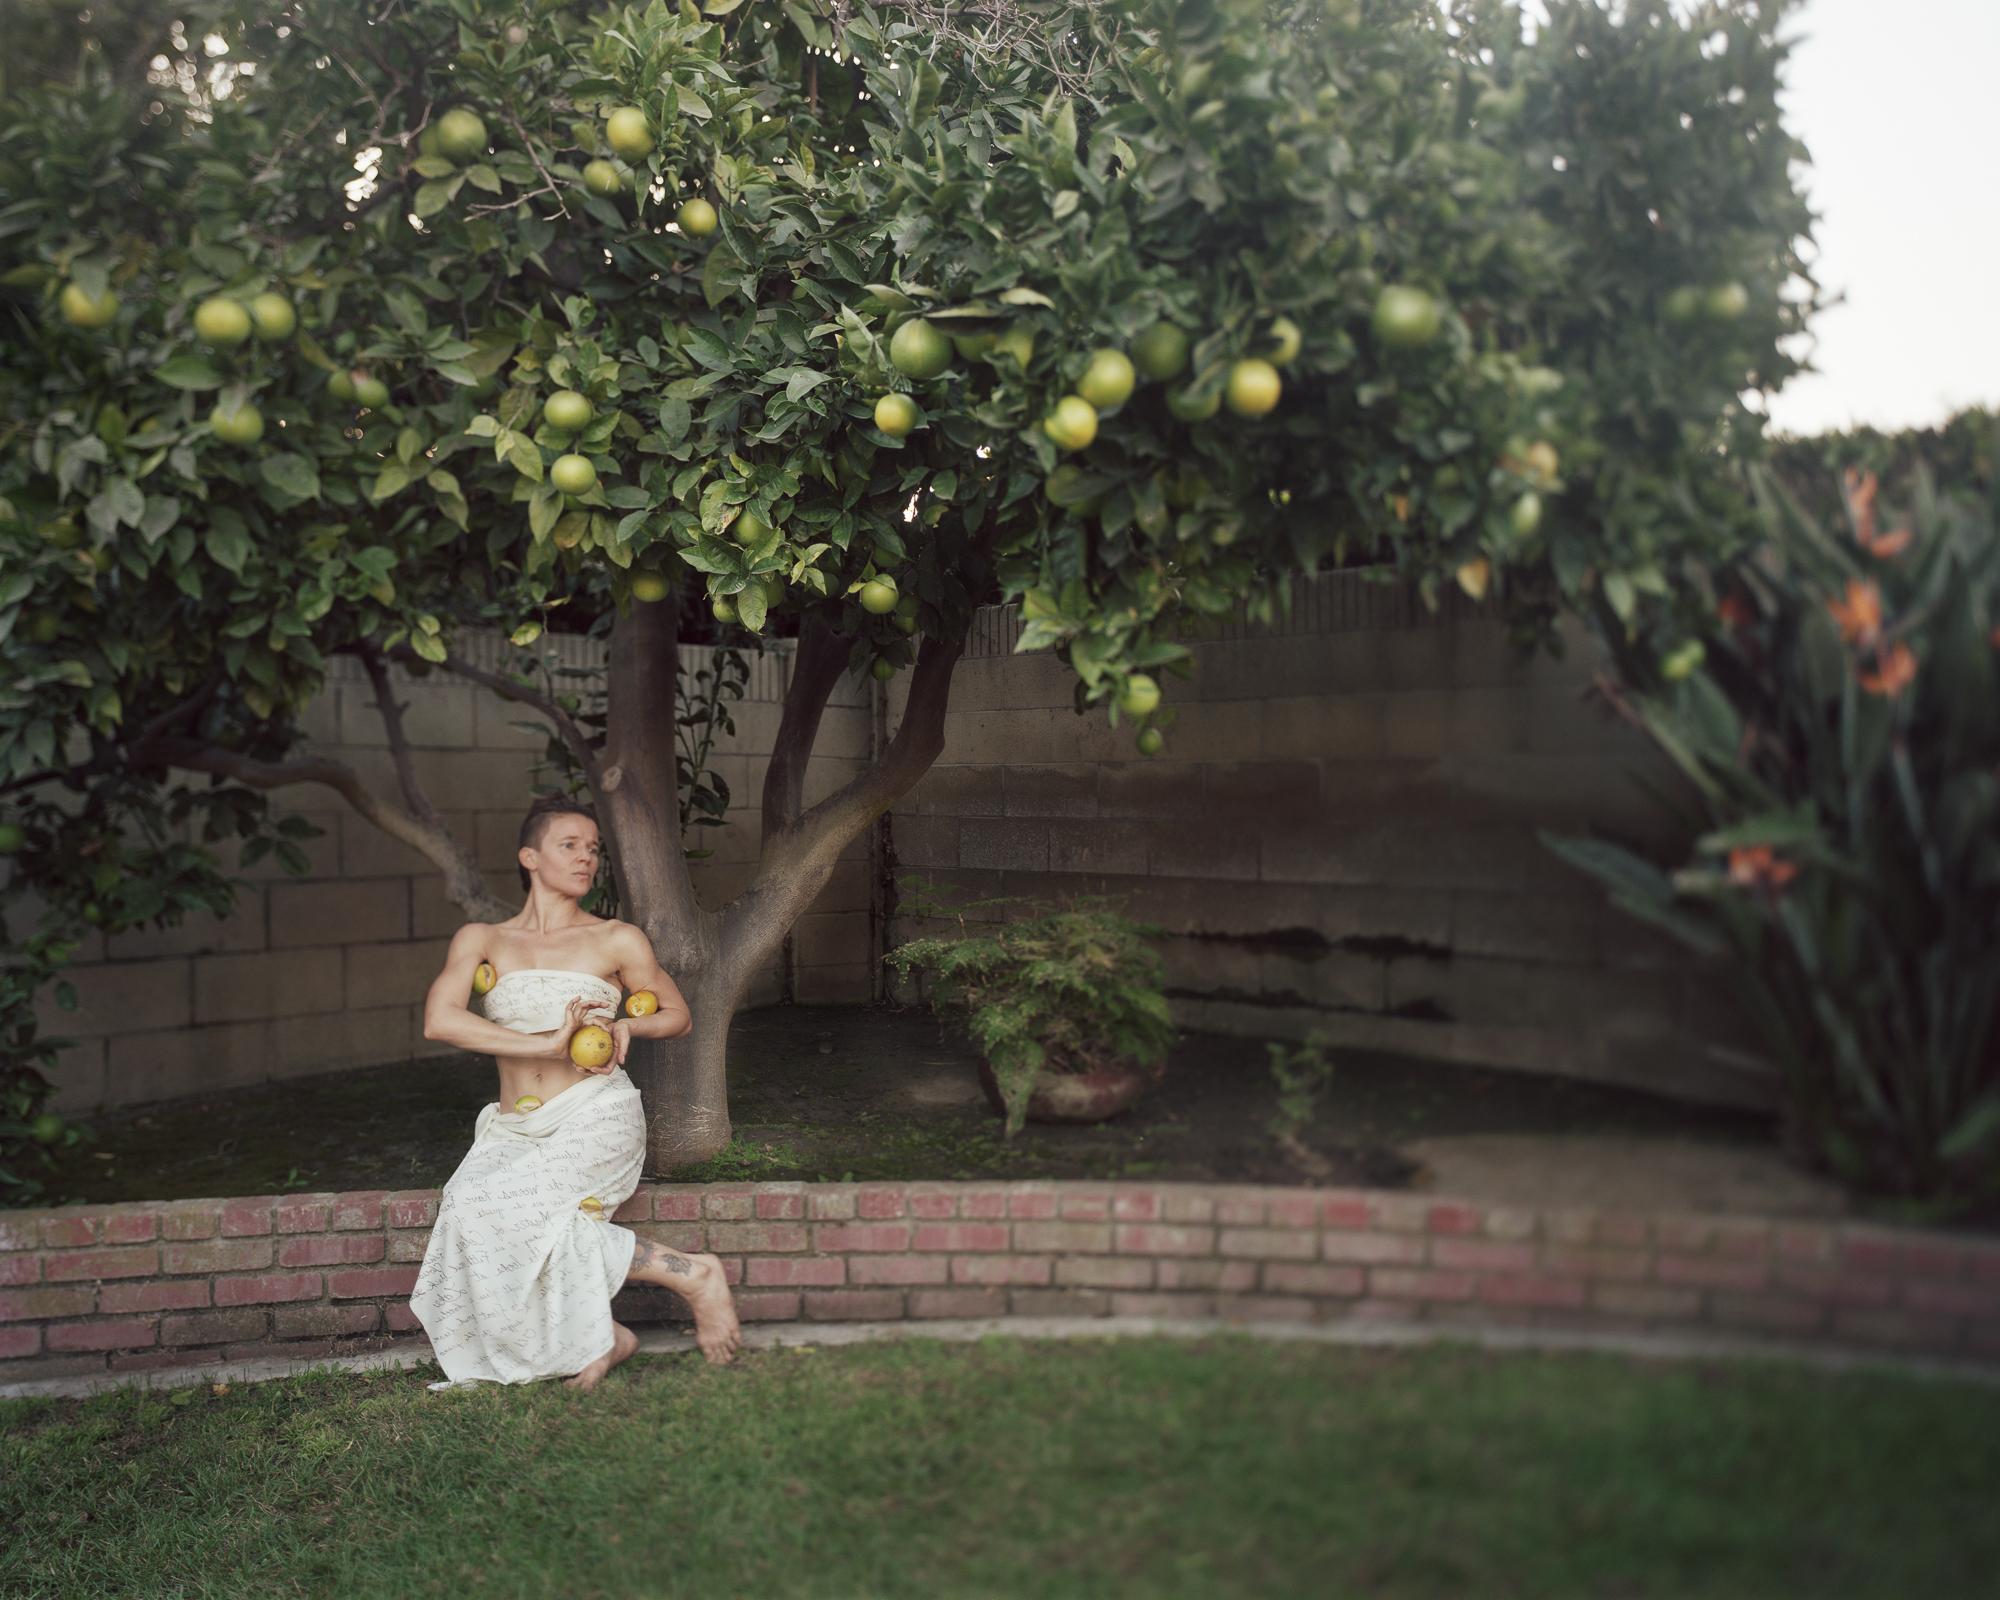 Tanne Willow, MATRIARCH,Tanne Willow Matriarch, LAKE, M016,_.jpg